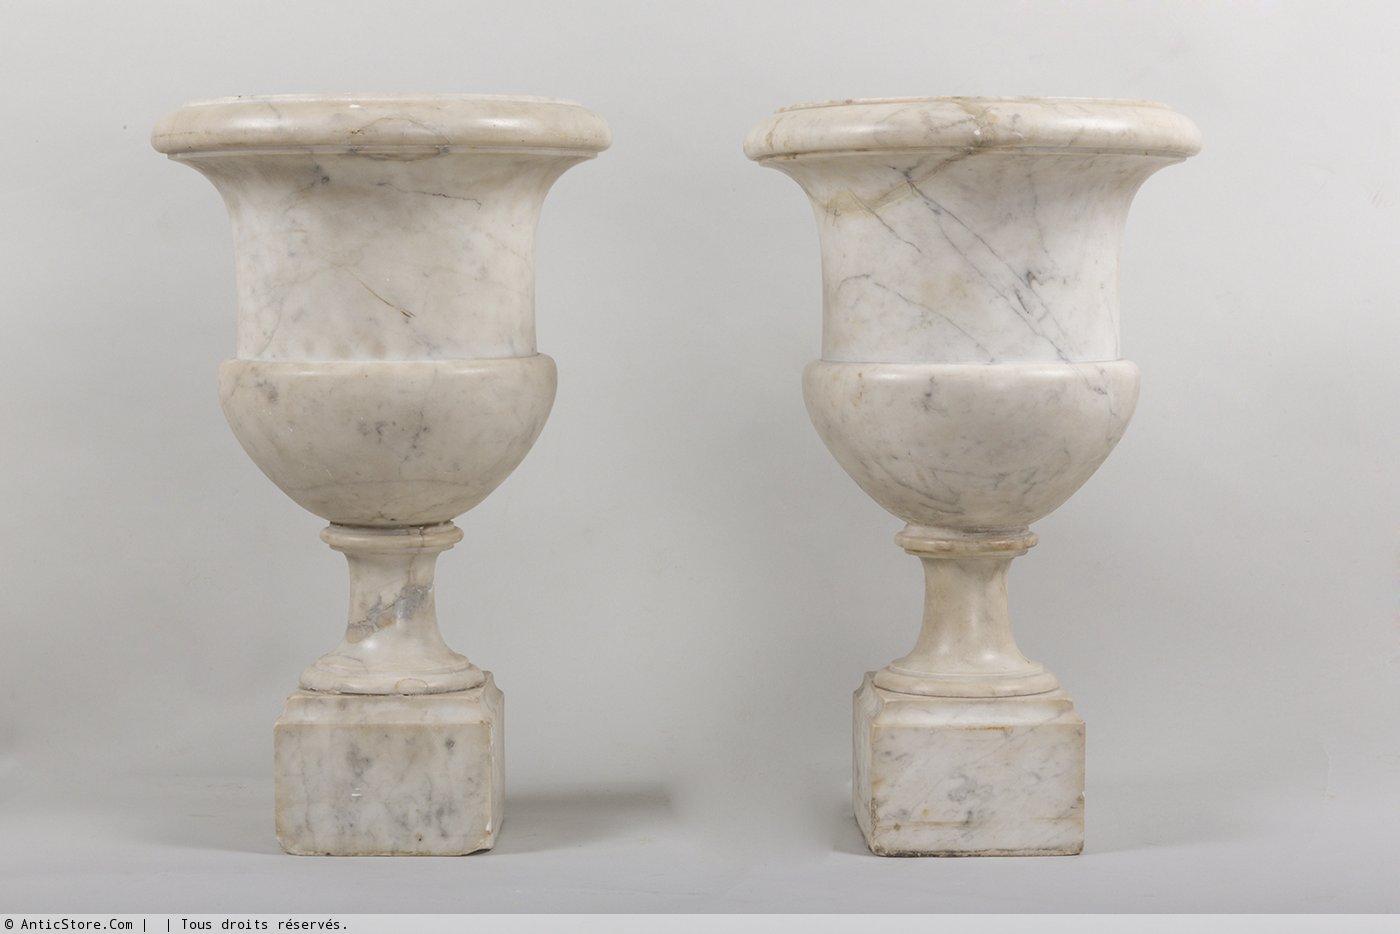 paire de vases m dicis en marbre de carrare xixe si cle. Black Bedroom Furniture Sets. Home Design Ideas